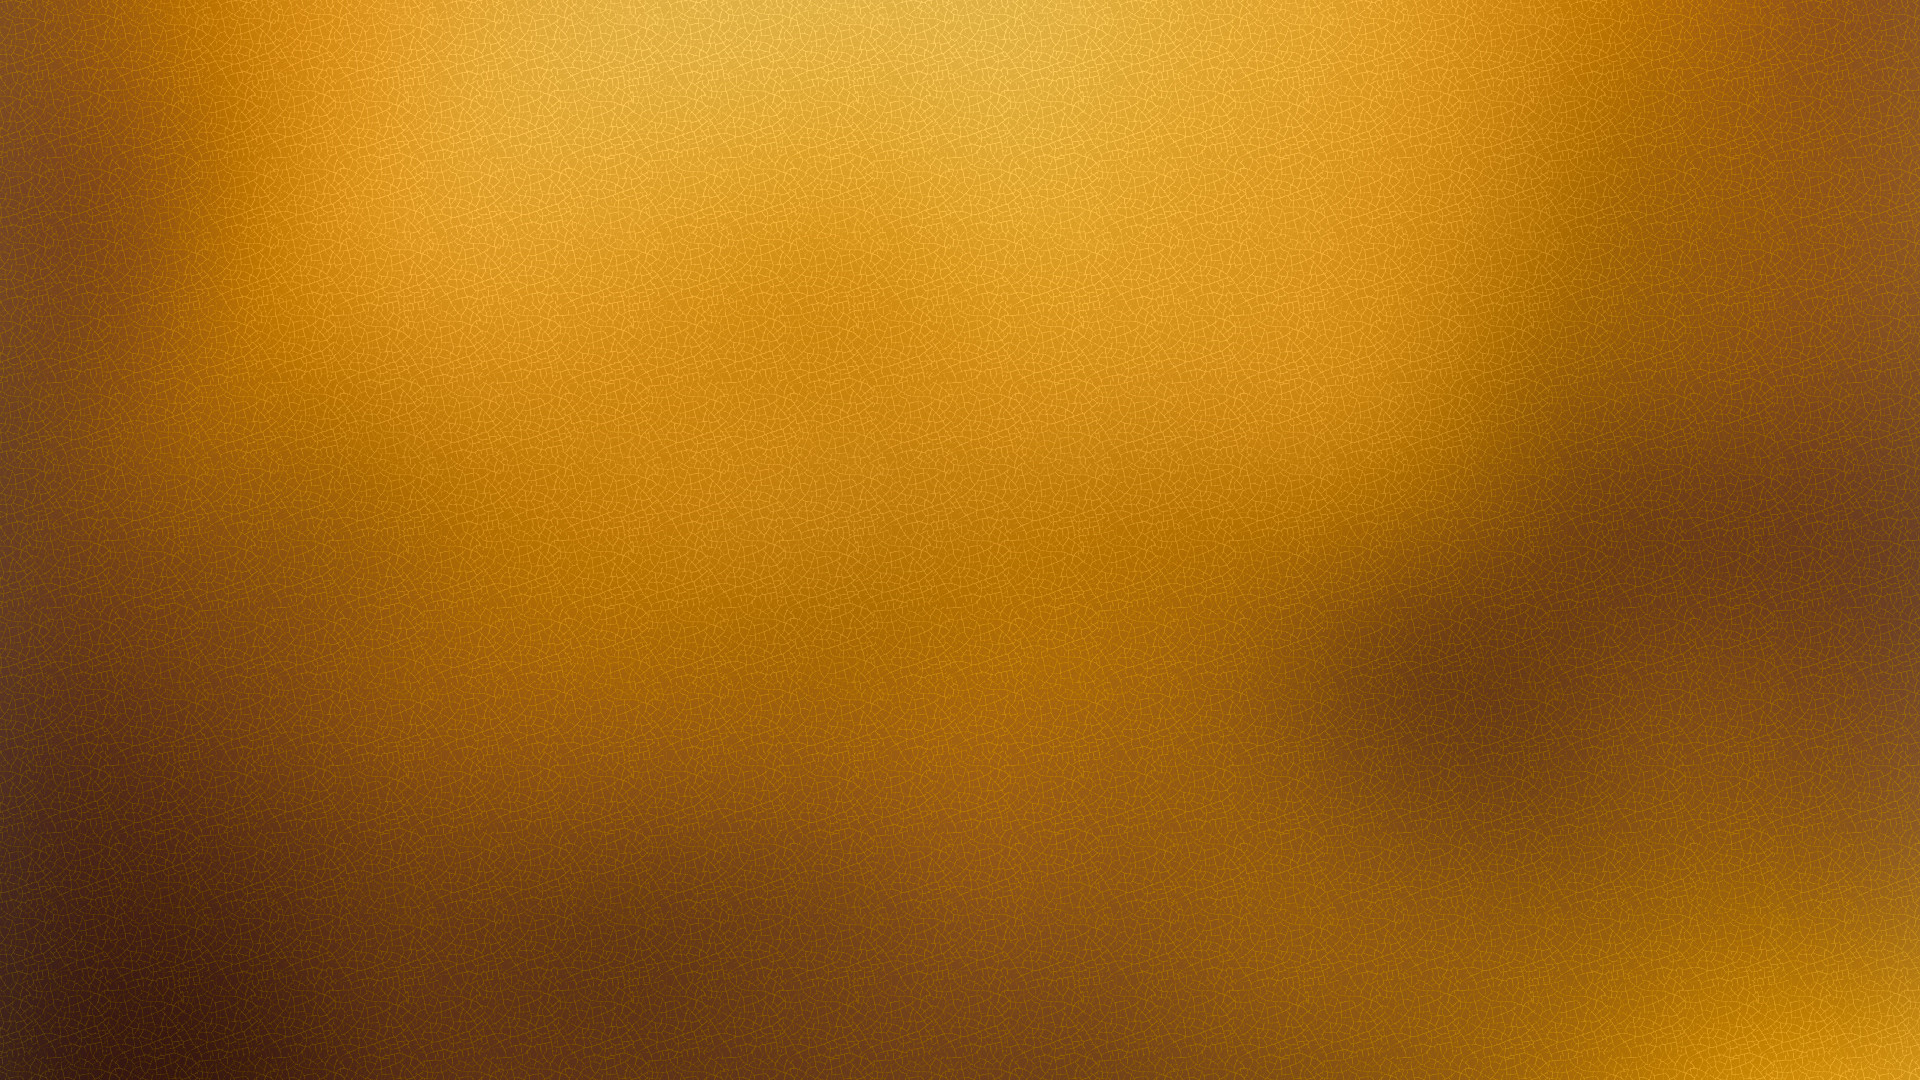 Gold Metallic Wallpaper #8762